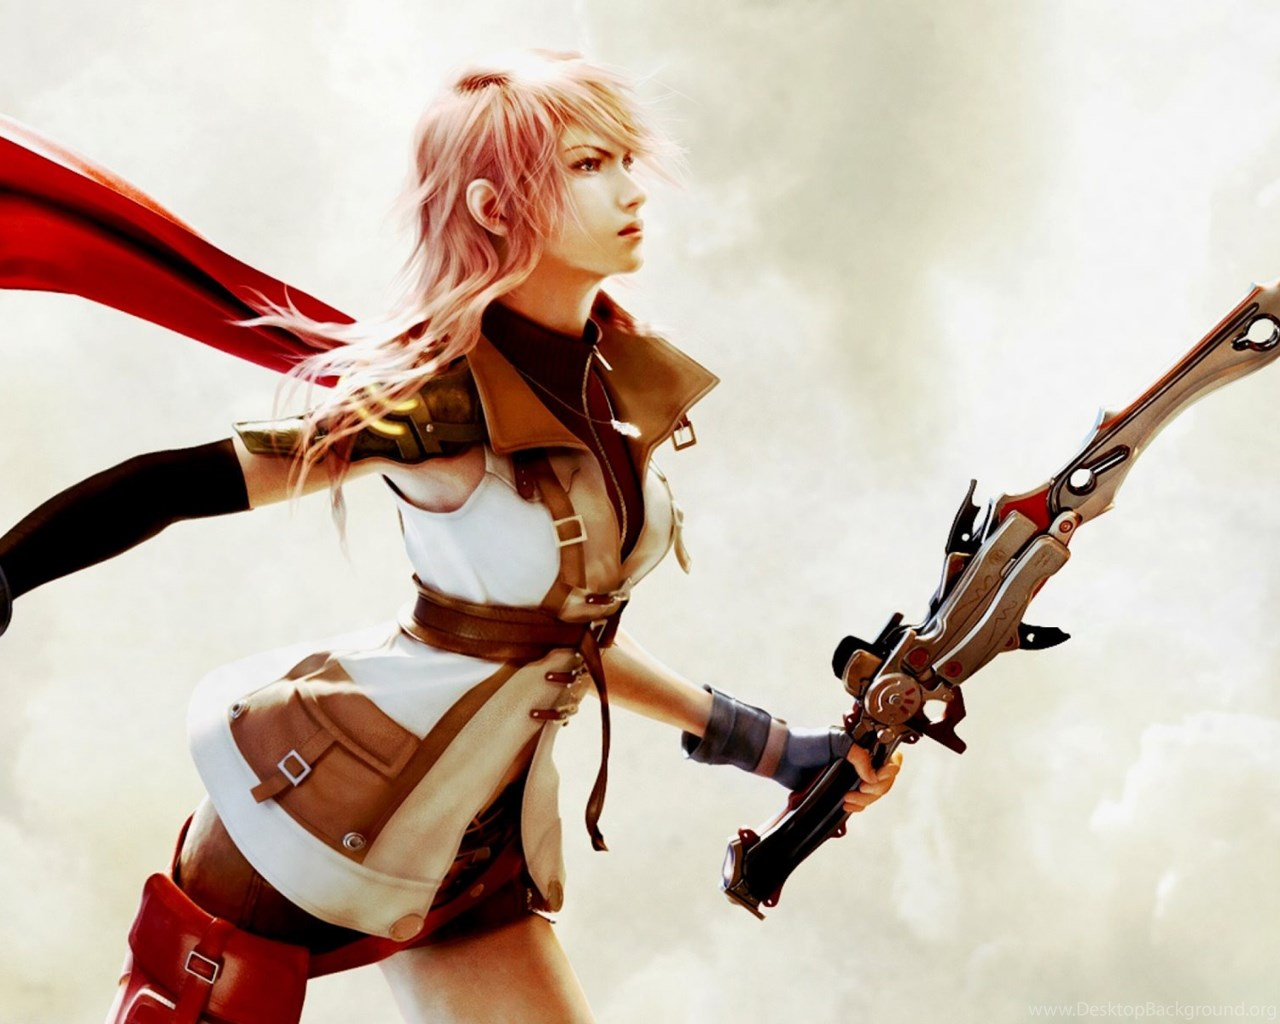 Lightning Final Fantasy Xiii Wallpapers For Widescreen Desktop Pc